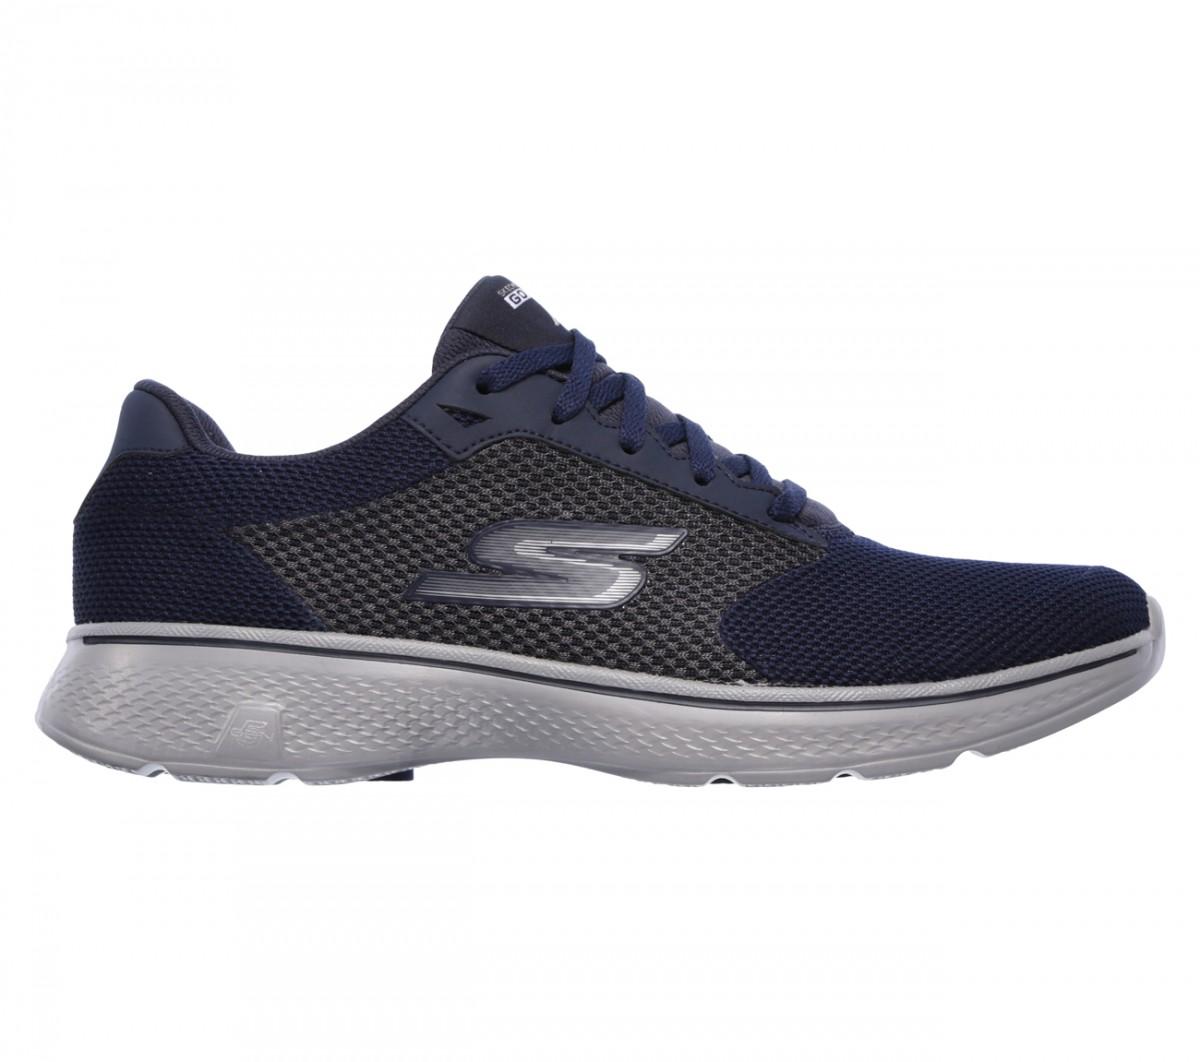 c4acb79f6 Bizz Store - Tênis Masculino Skechers Go Walk 4 Caminhada